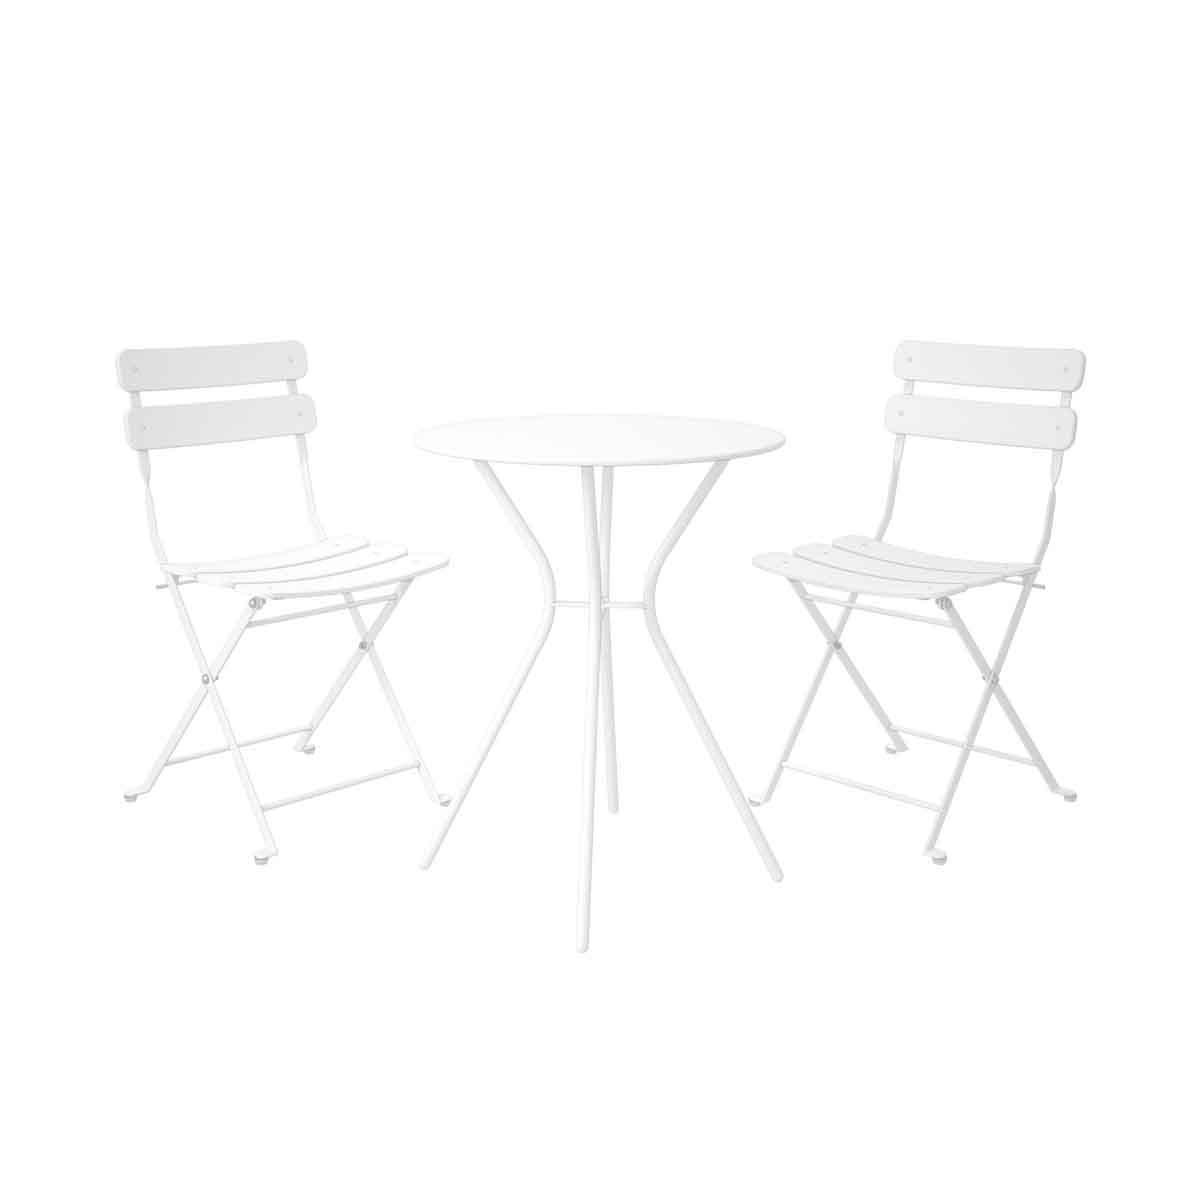 Dorel 3 Piece Metal Bistro Set - White